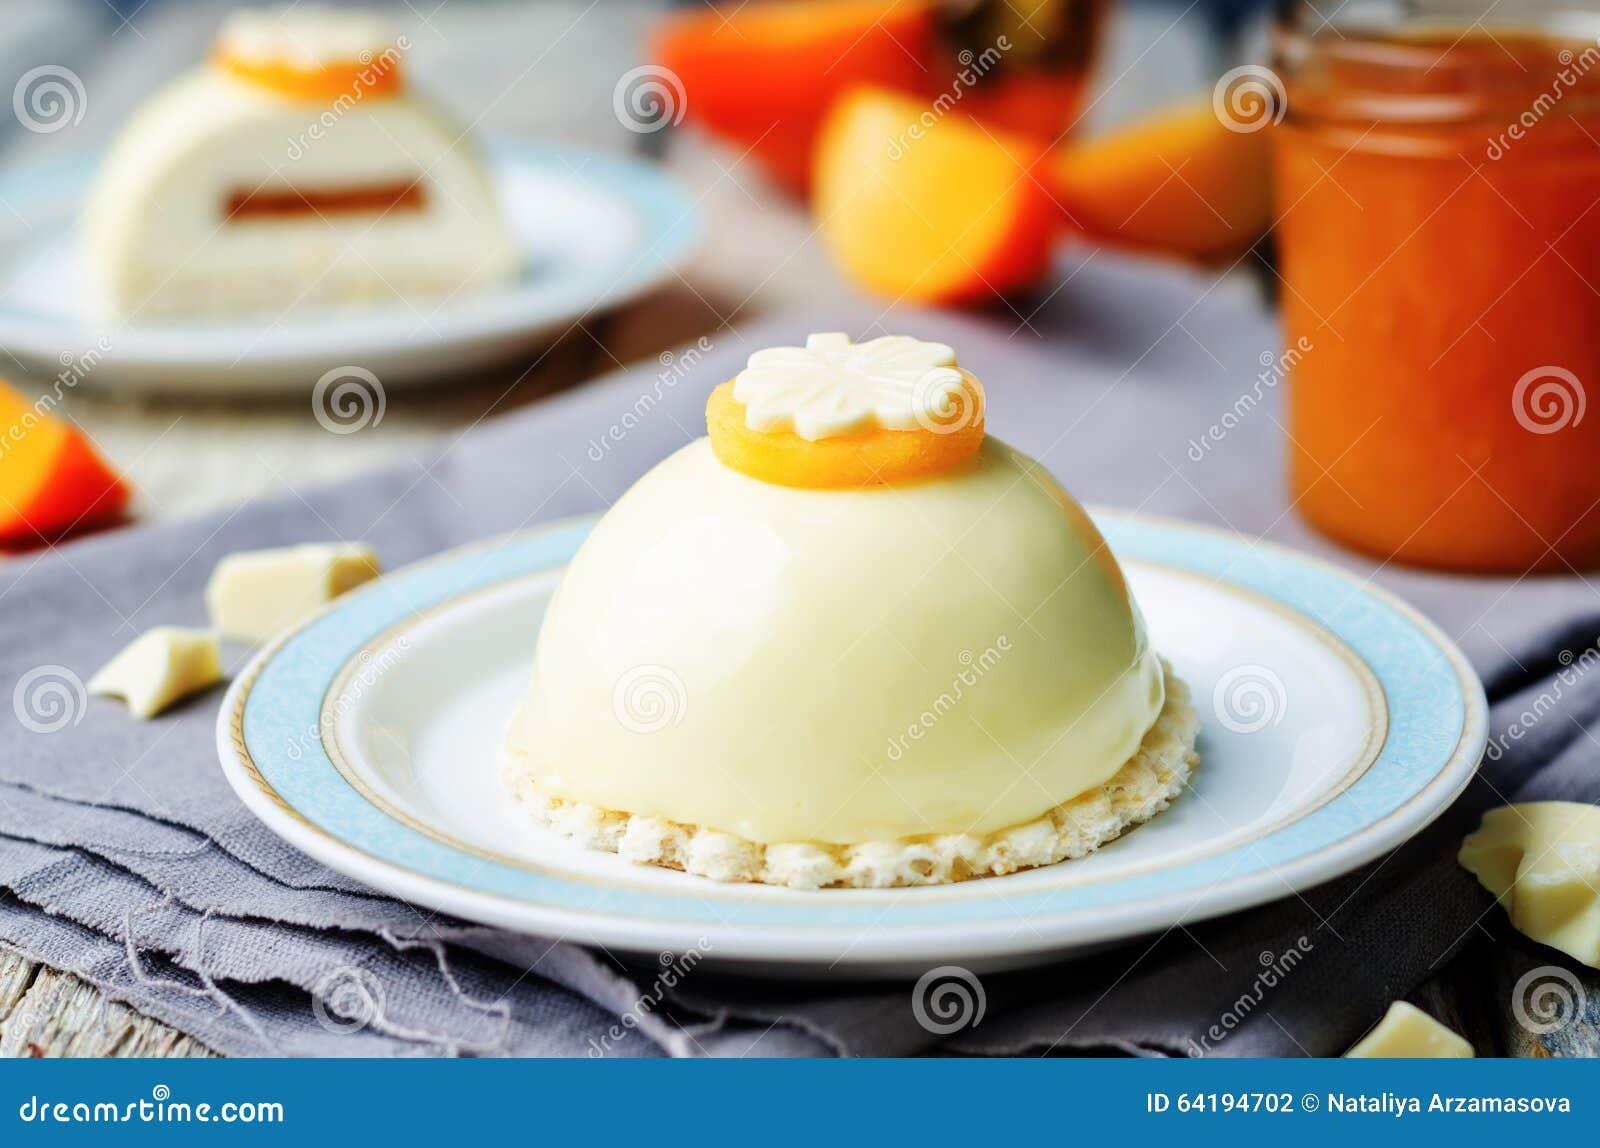 Persimmon White Chocolate Cream Cheese Mousse Cake Stock Photo ...